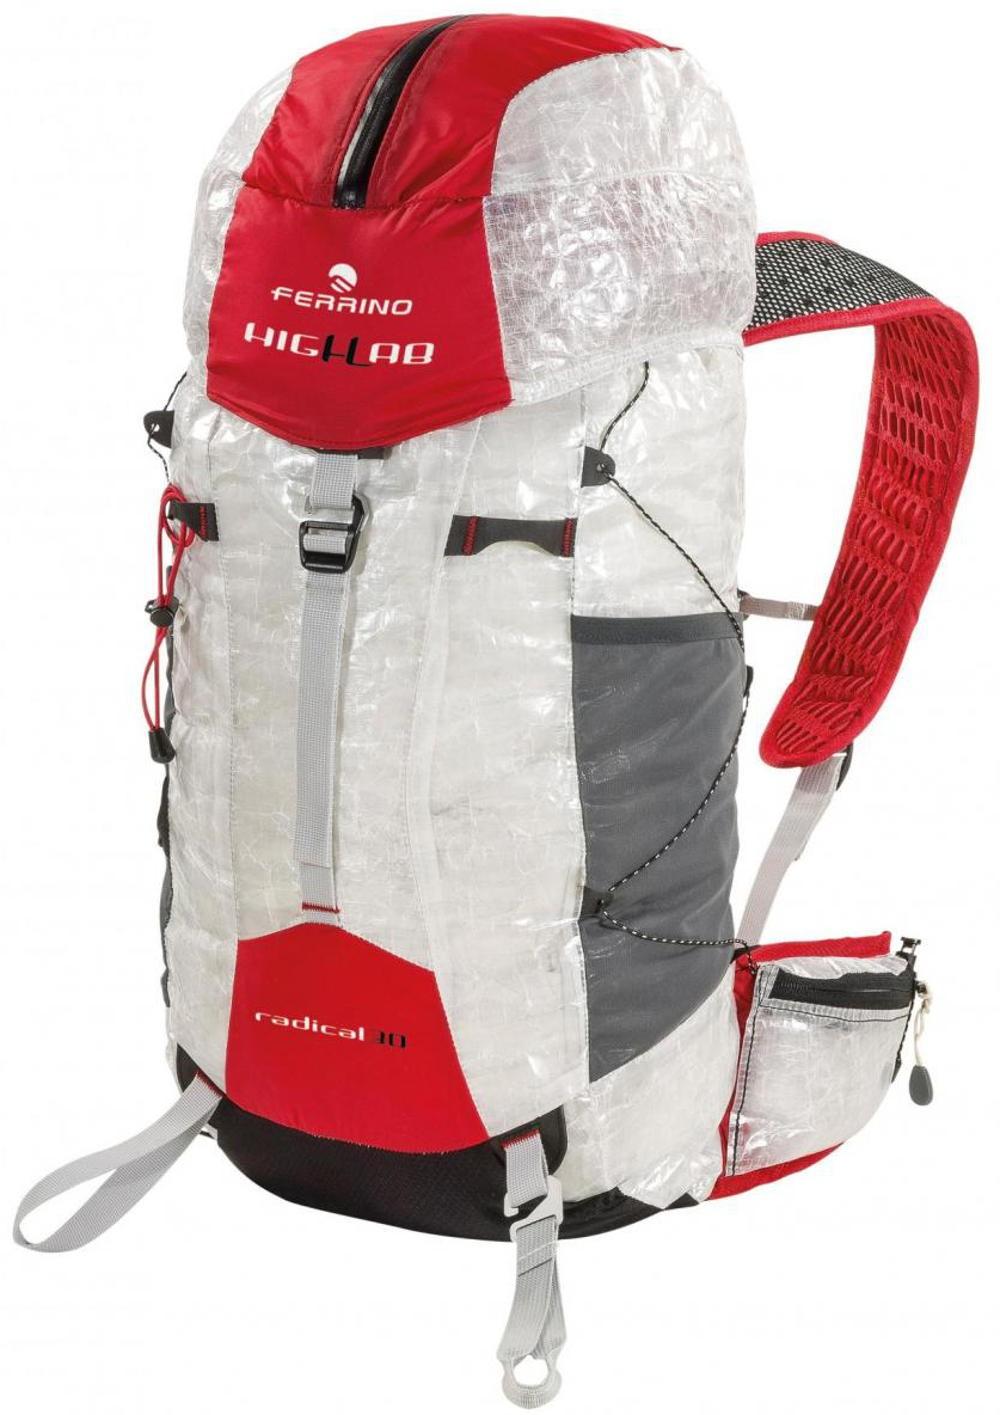 b963d8b36258d Weld.pl - Plecaki Plecaki wspinaczkowe LEKKI PLECAK WSPINACZKOWY ...